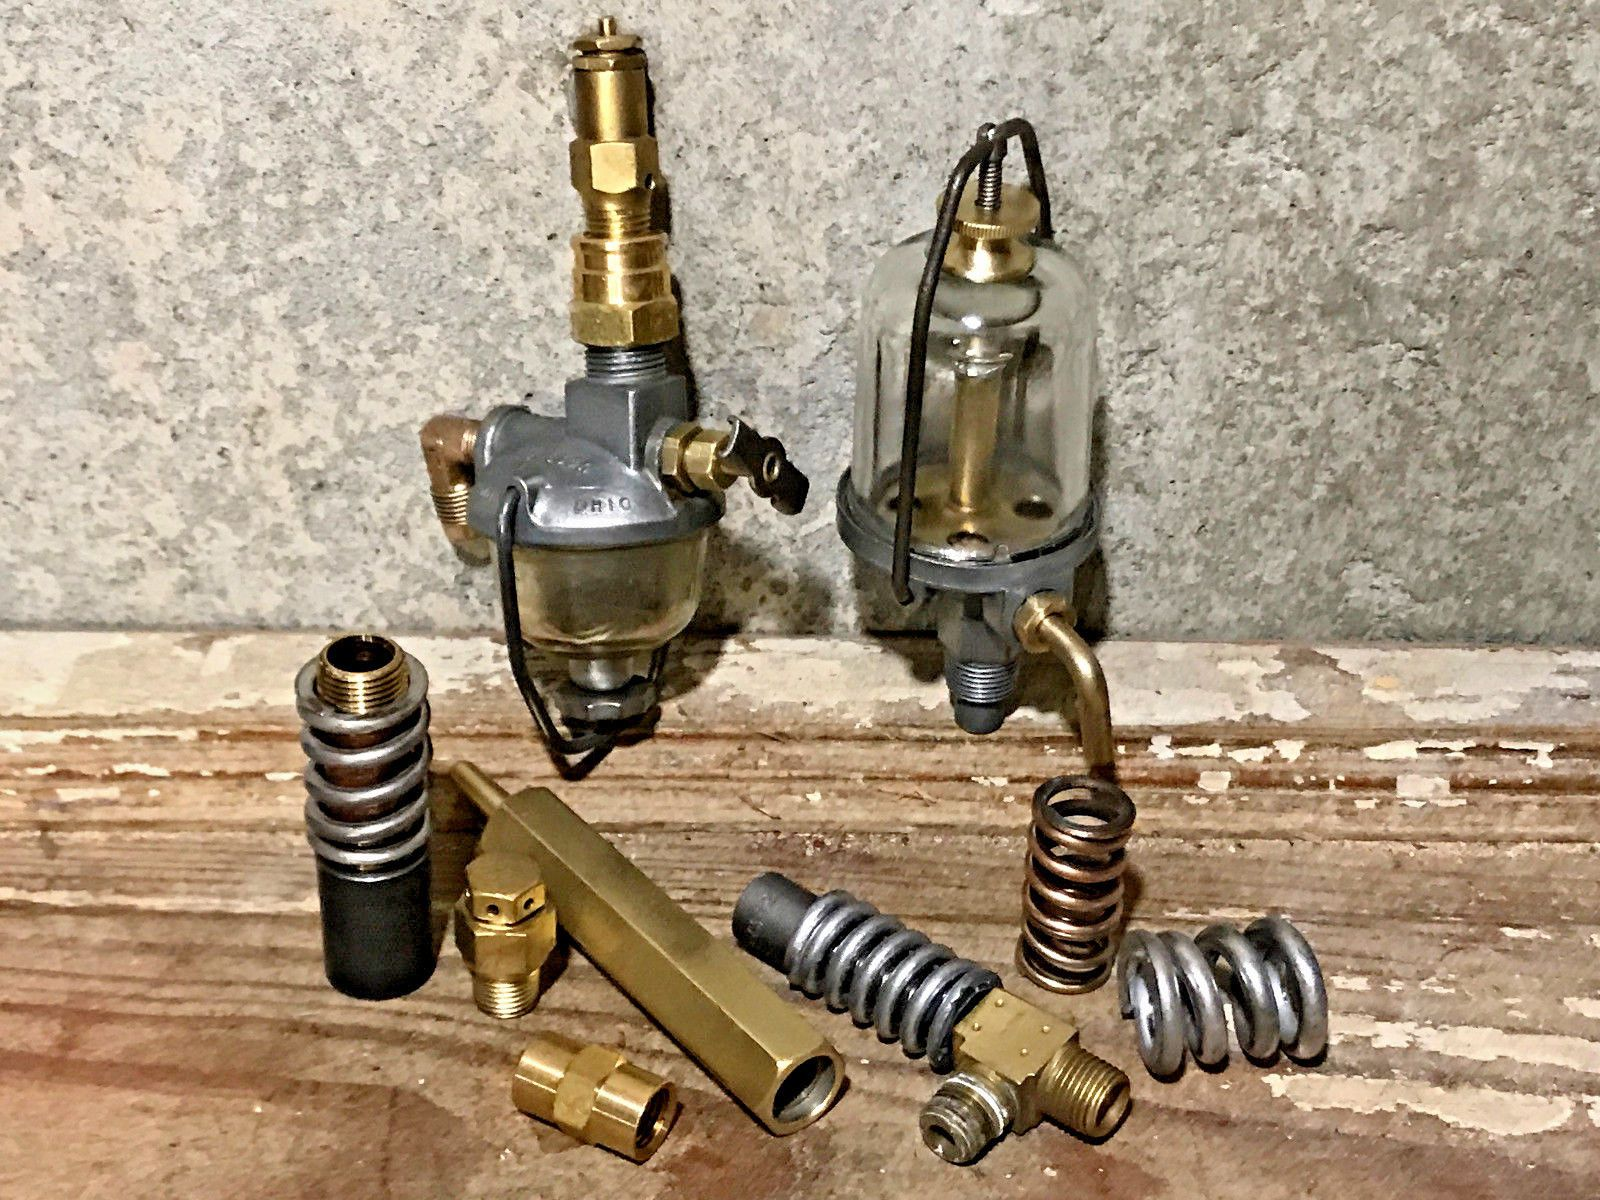 vintage brass steampunk lamp part lot fuel filter pressure valve gauge fitting [ 1600 x 1200 Pixel ]